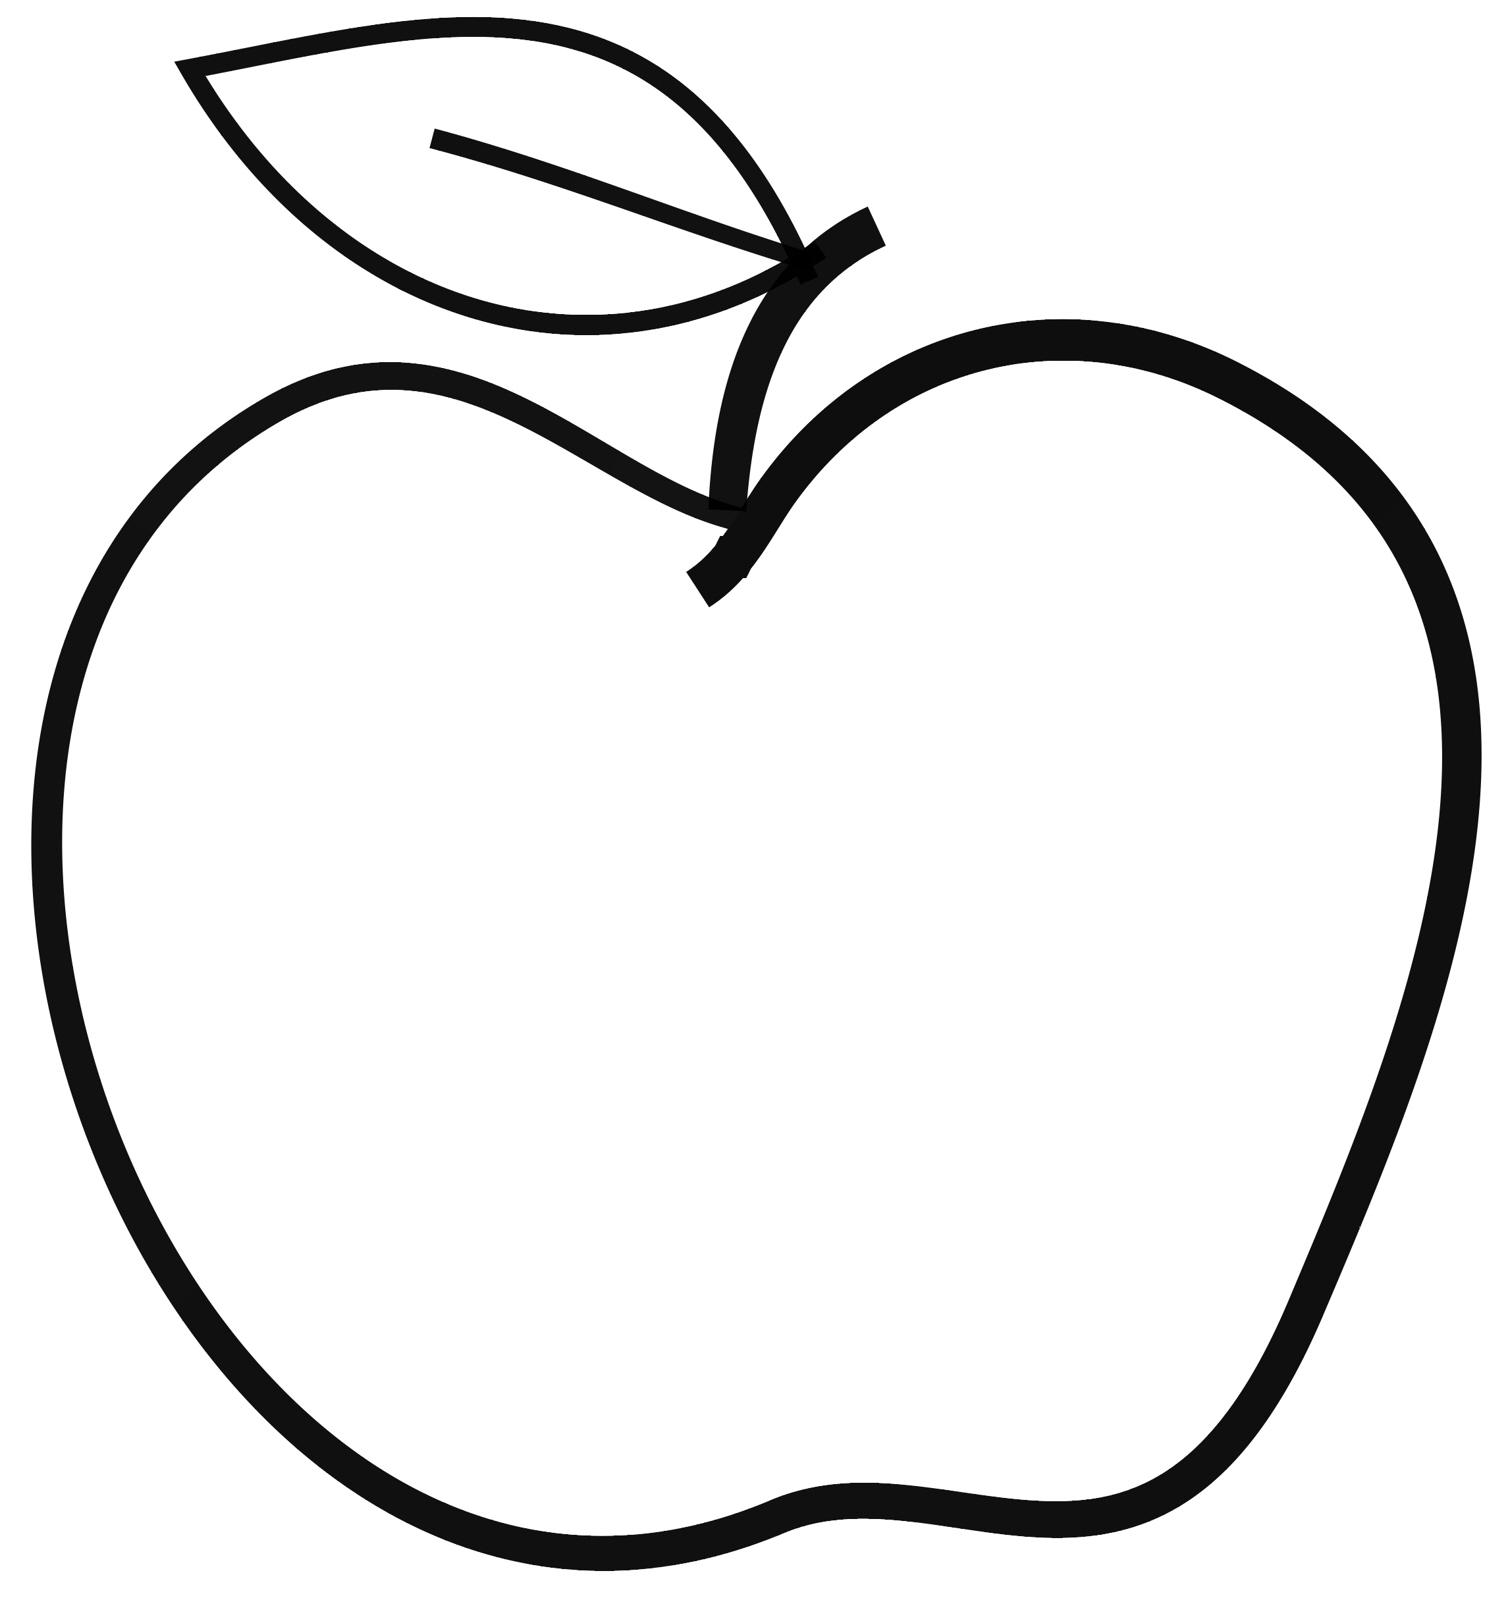 Free Stock Photo 9111 apple line | freeimageslive